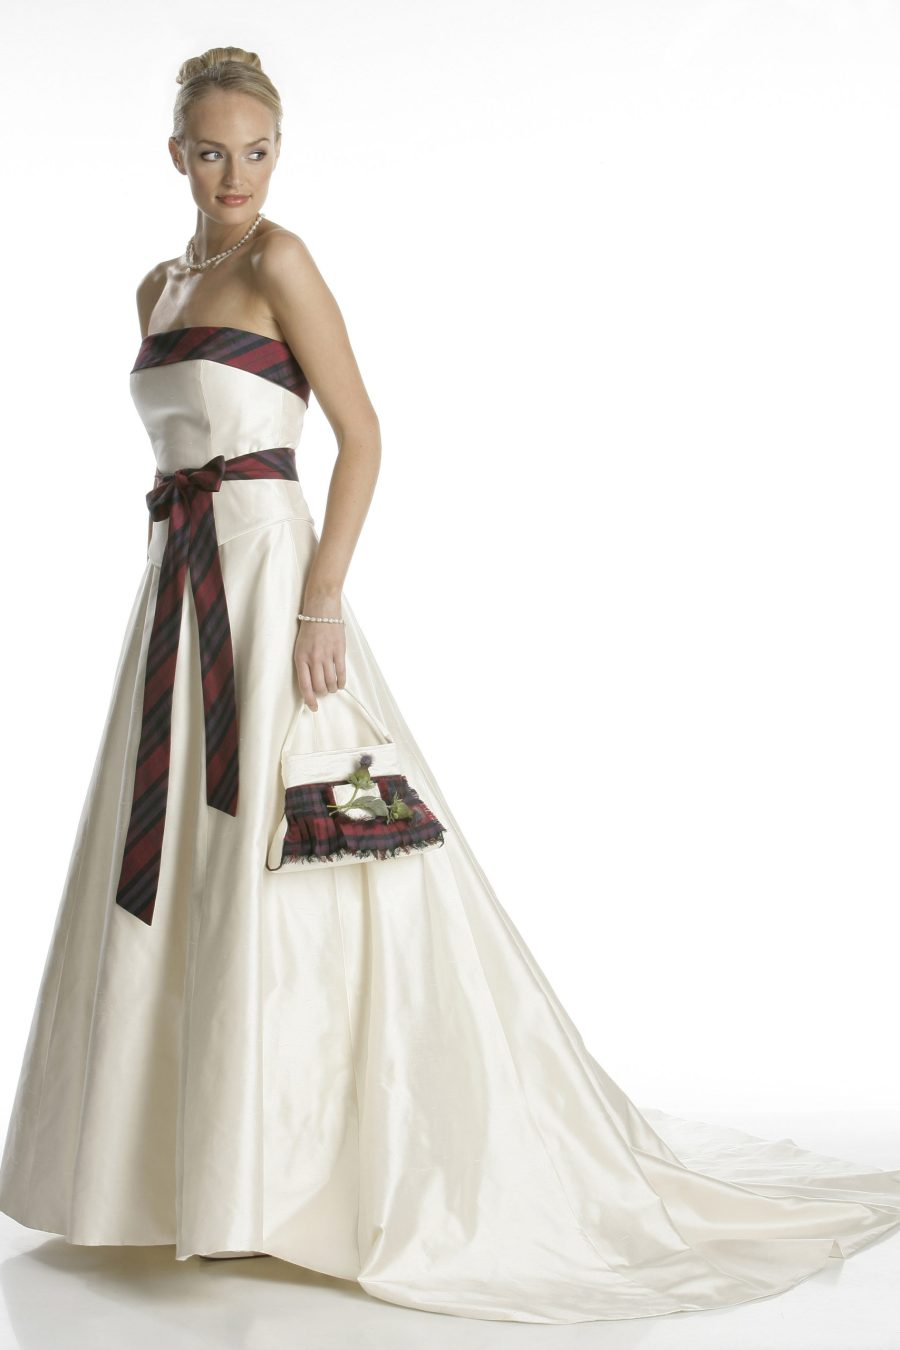 Joyce Young Tartan Weddings Lomond